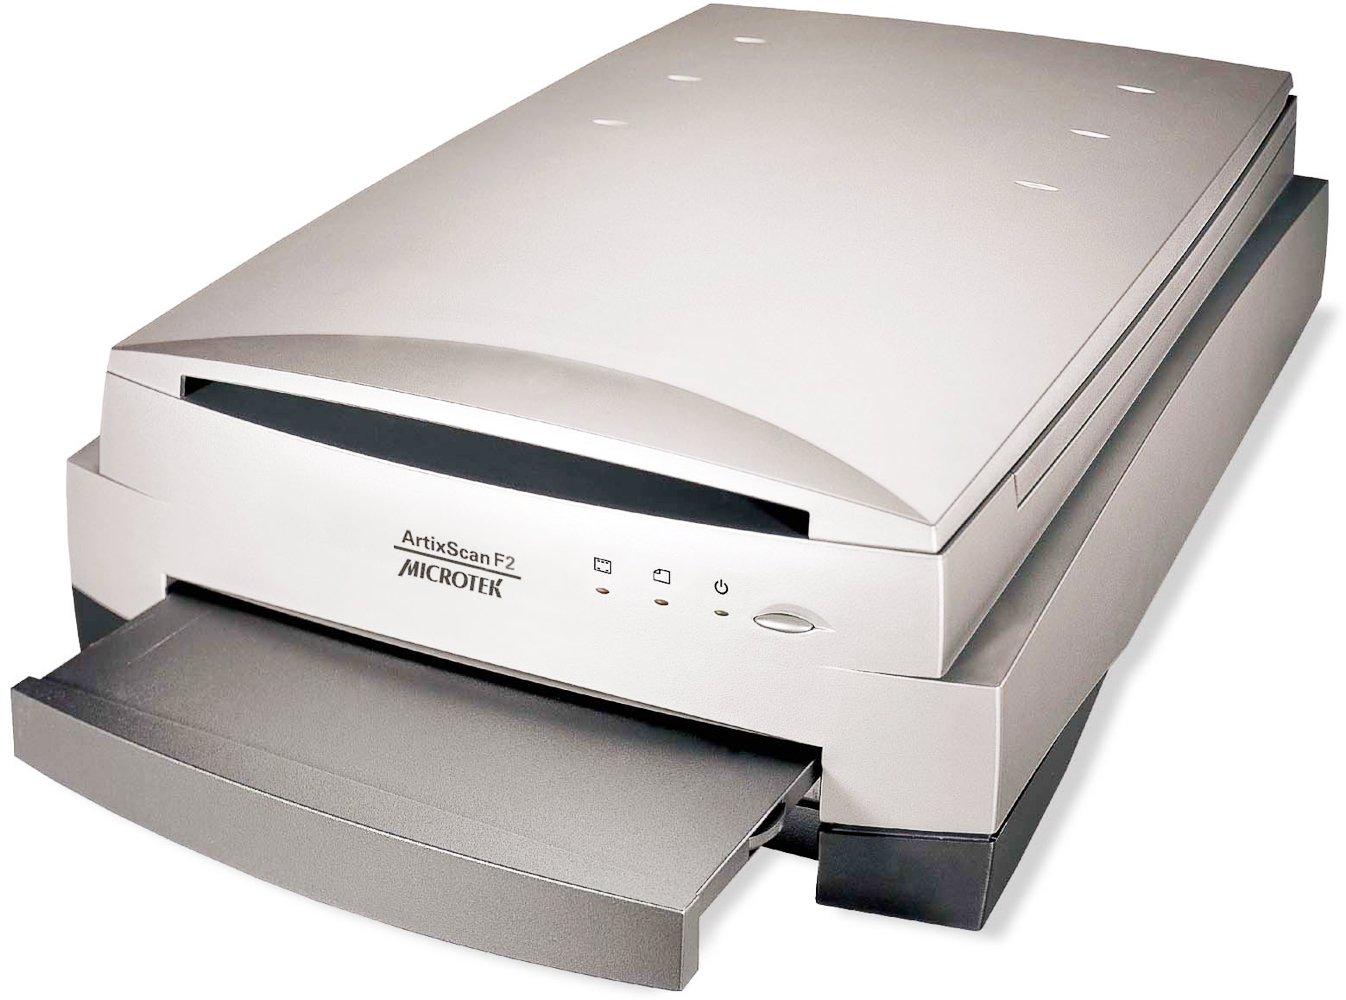 Microtek Artixscan F2 Scanner 1108-03-680202